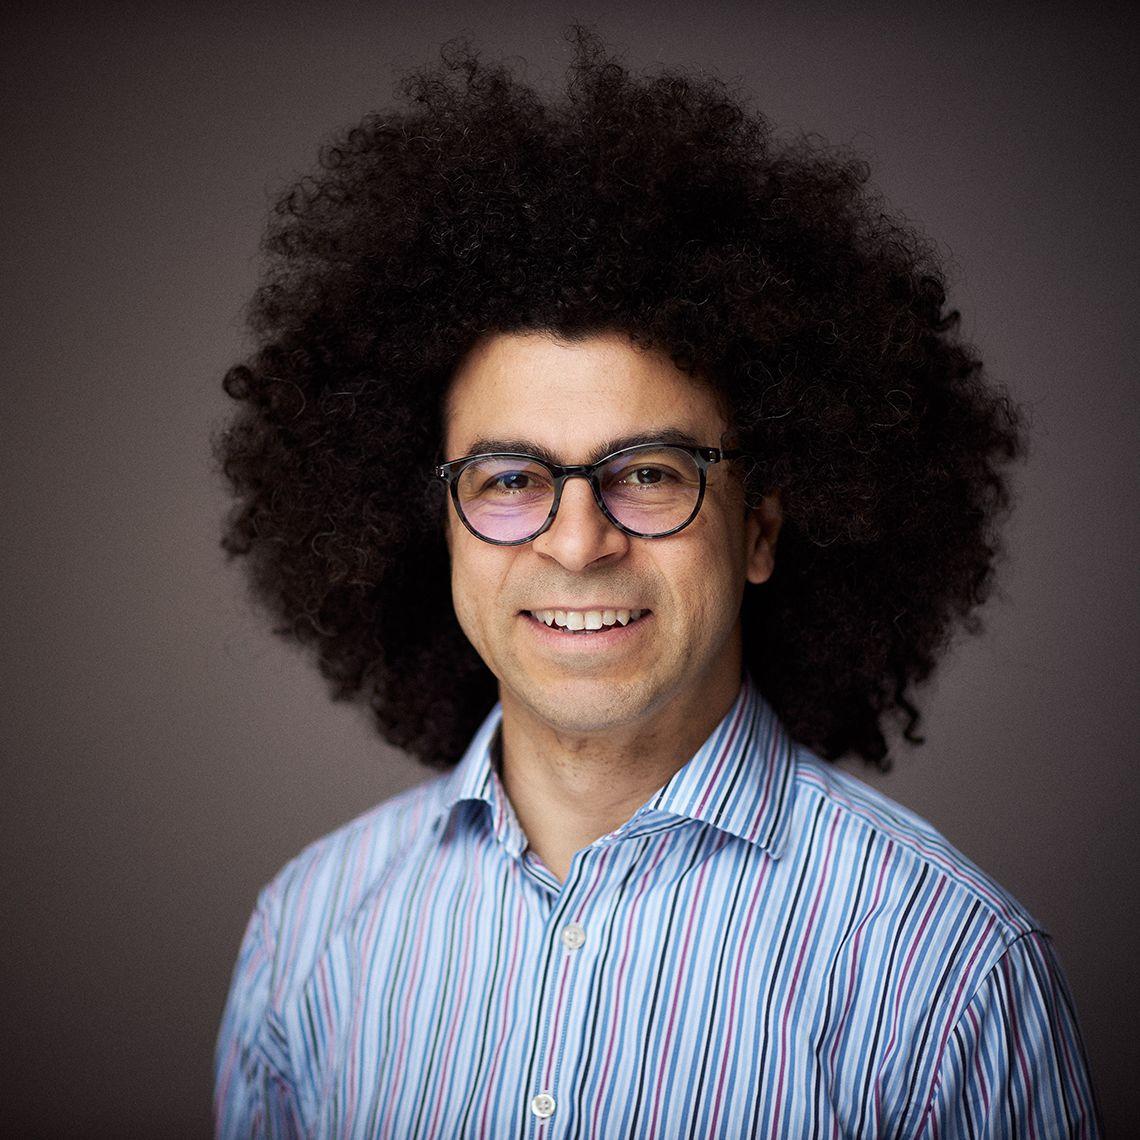 Dr Roger Nascimento (pronouns: he/him)